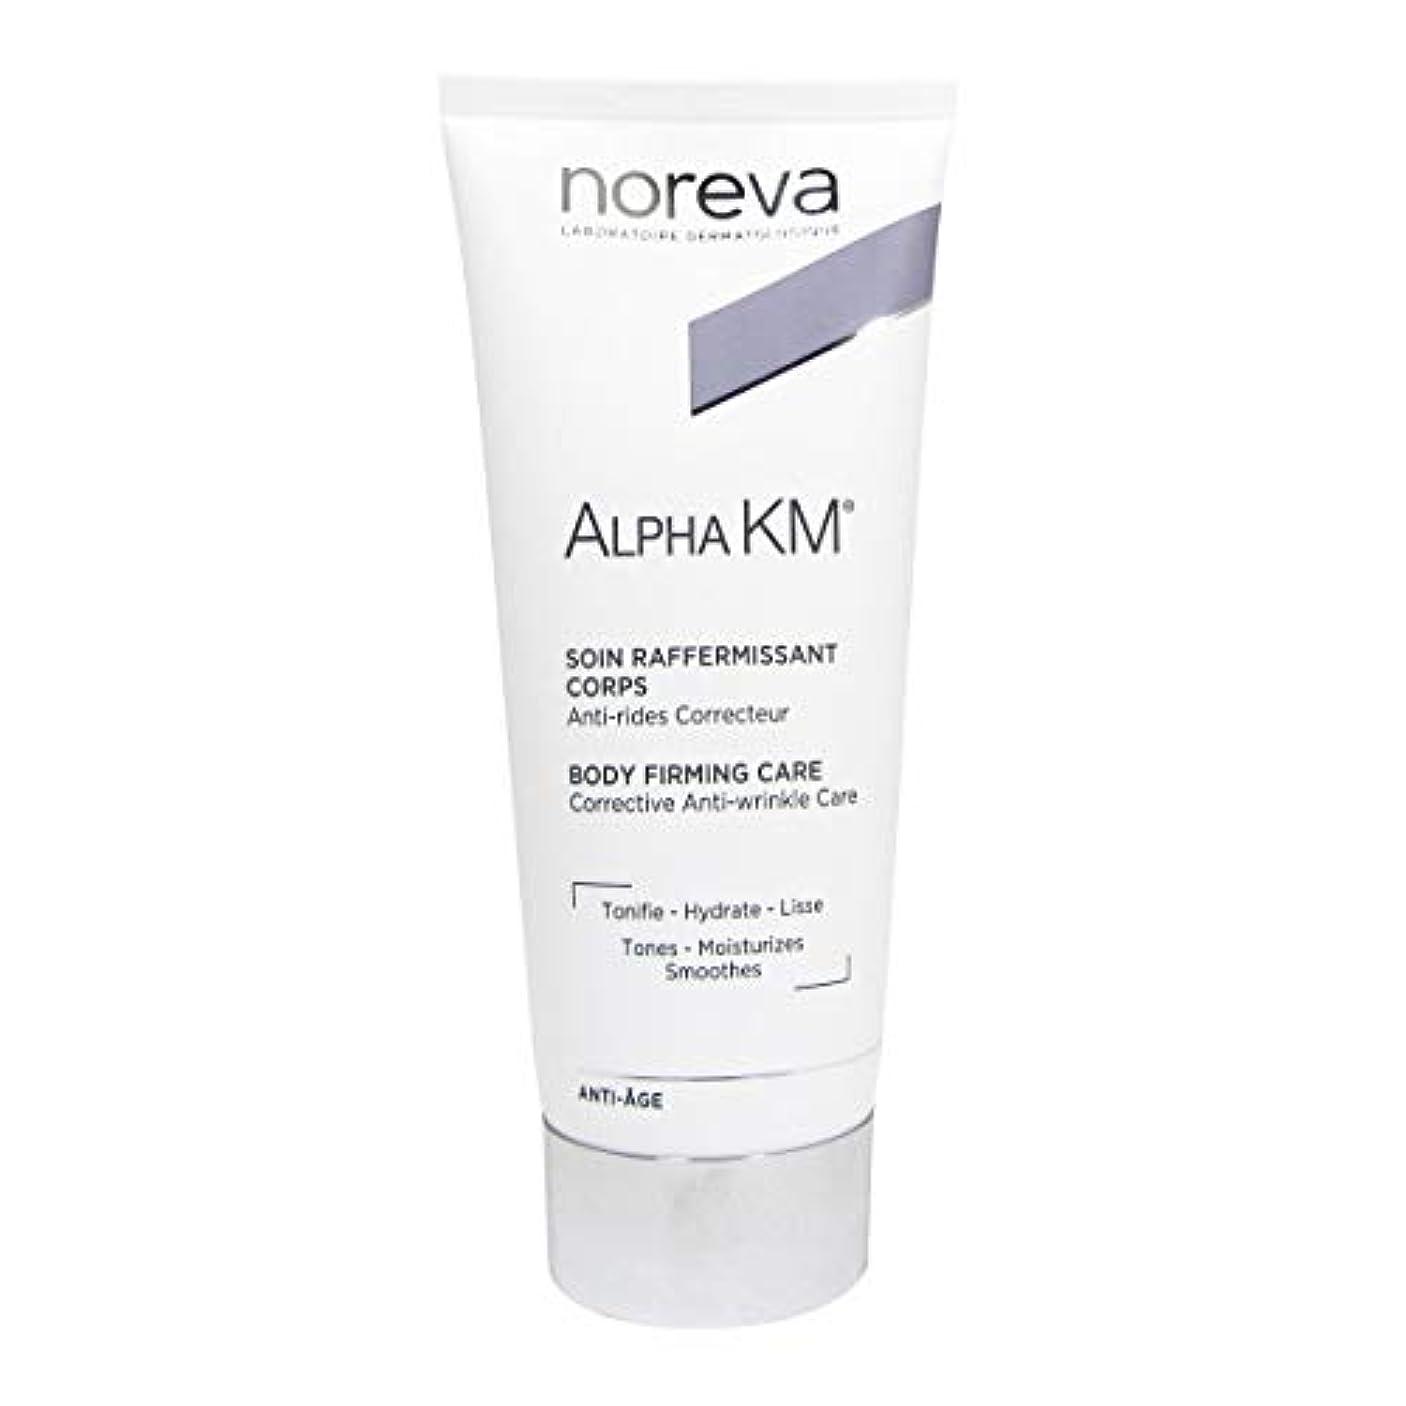 伝染性の息切れ数字Noreva Alpha Km Body Firming Anti-ageing Treatment 200ml [並行輸入品]